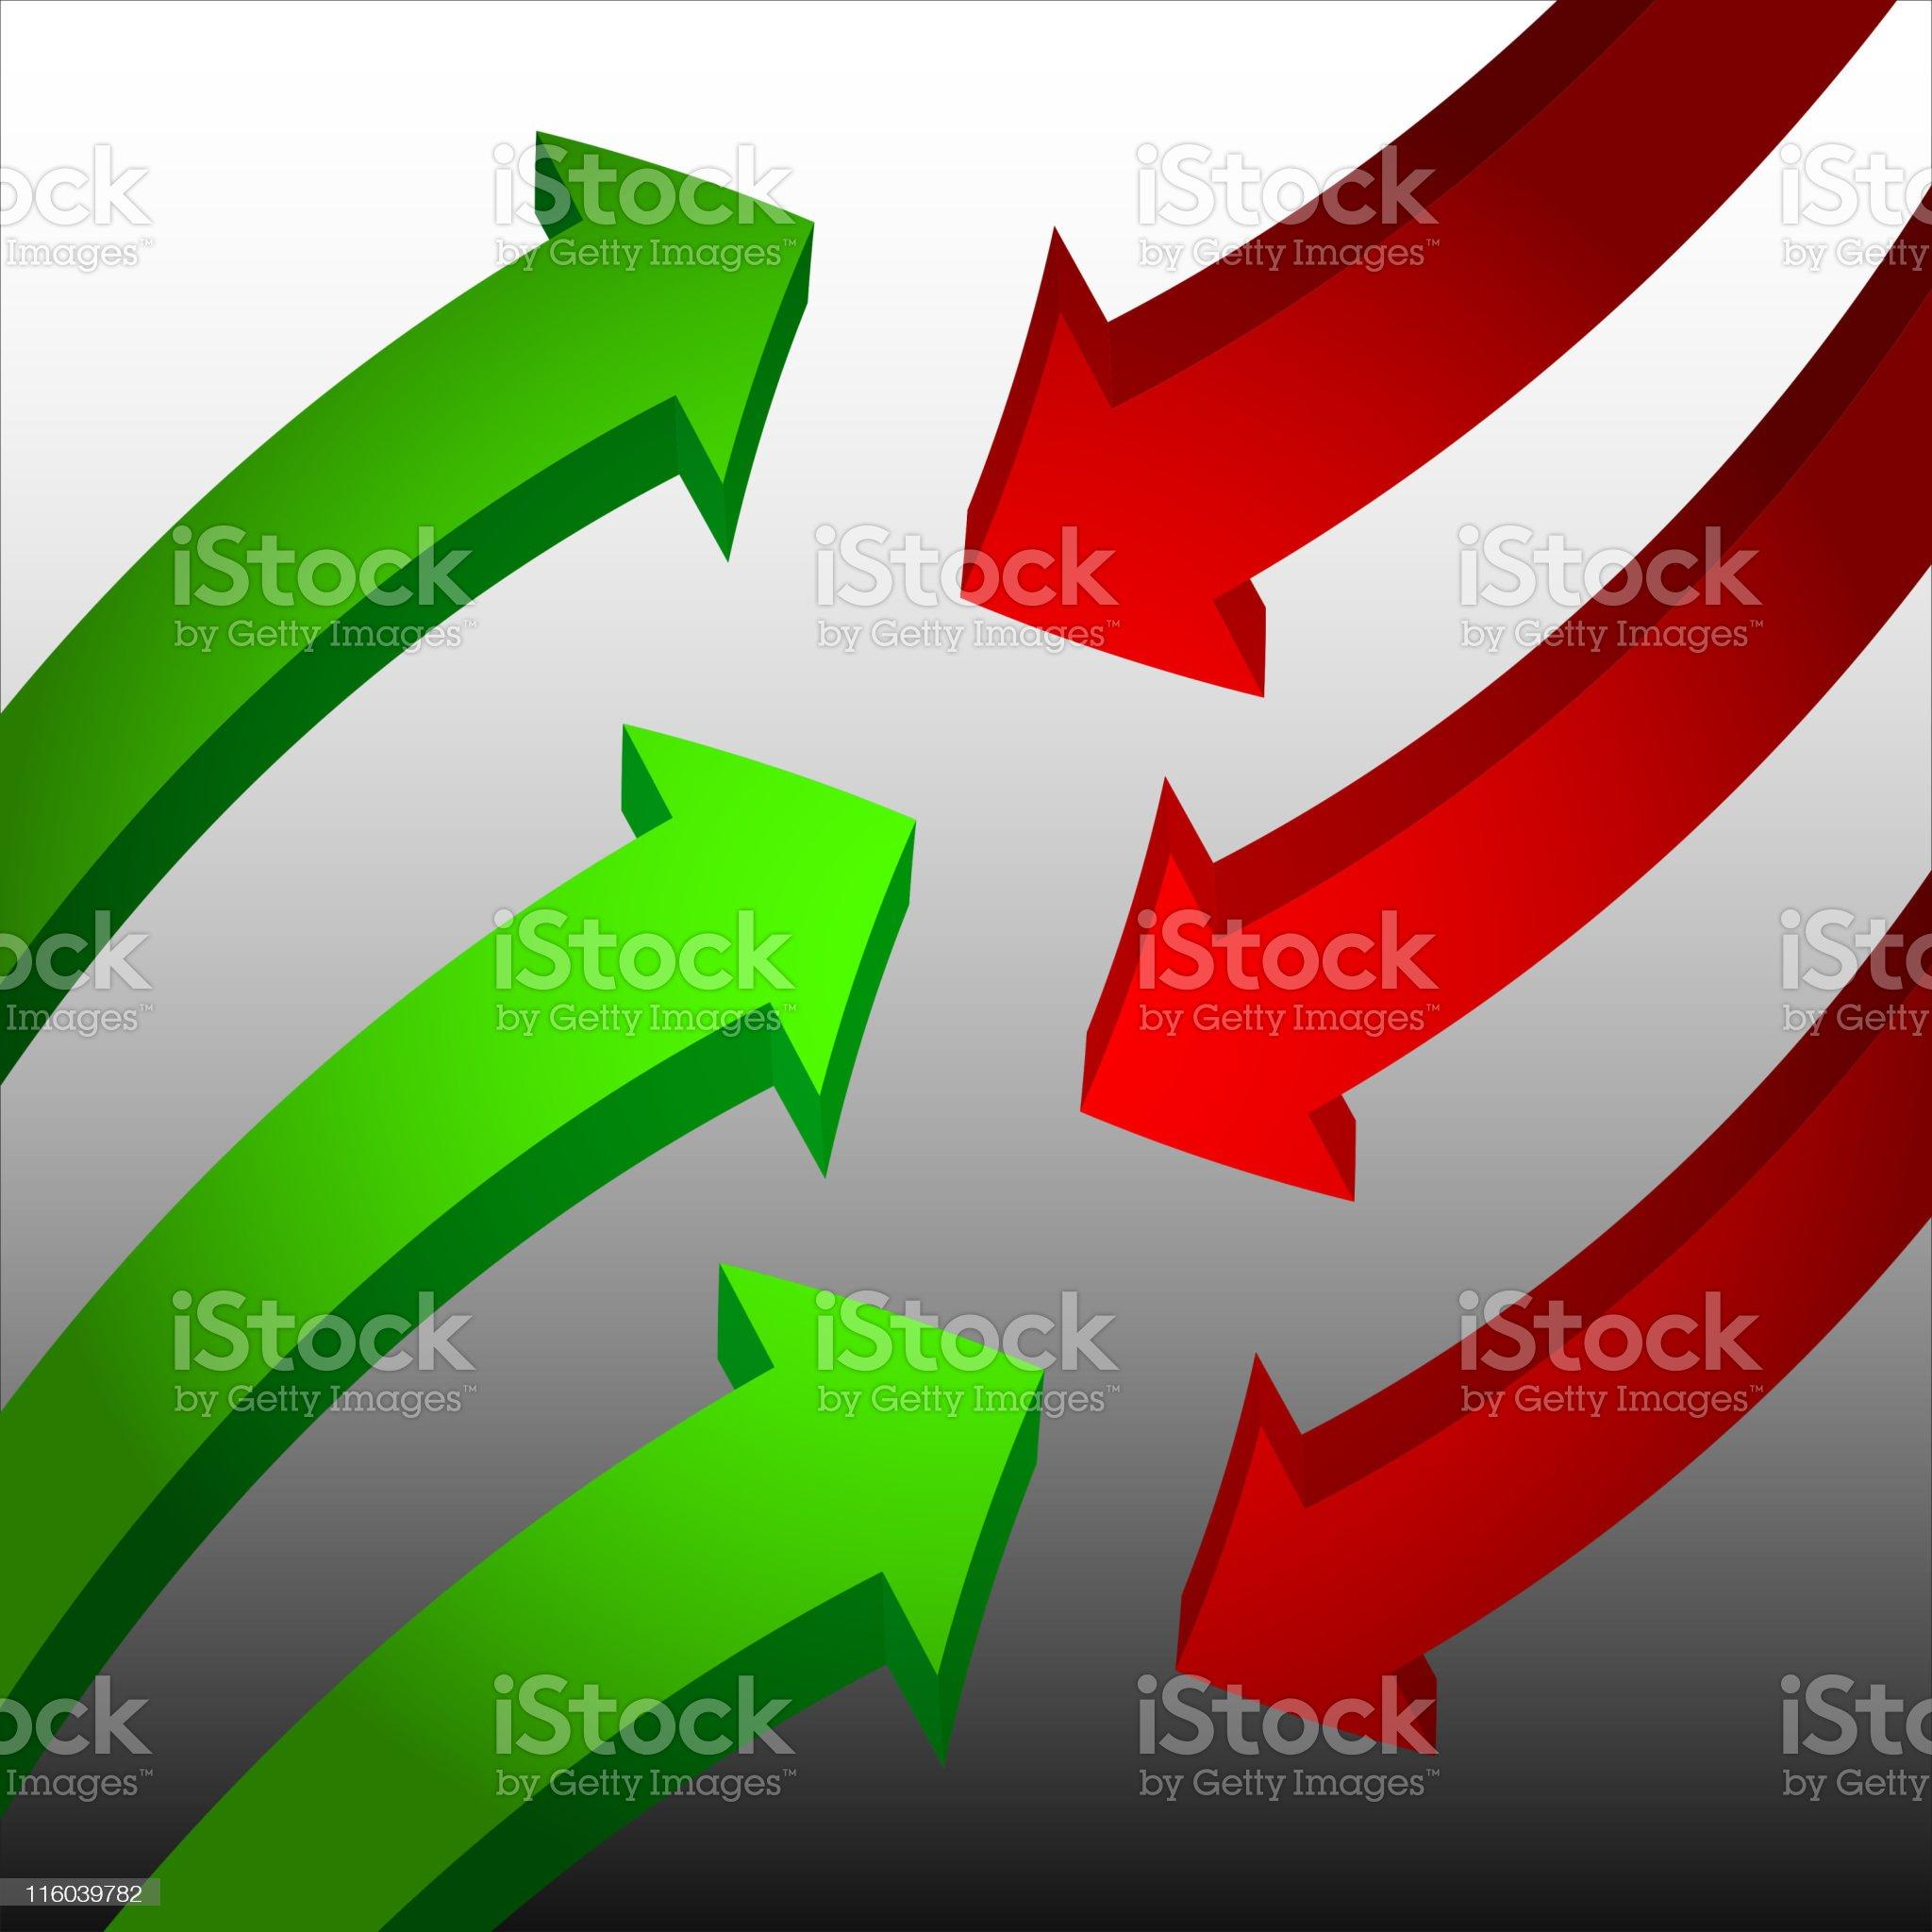 arrows collide royalty free vector royalty-free stock vector art